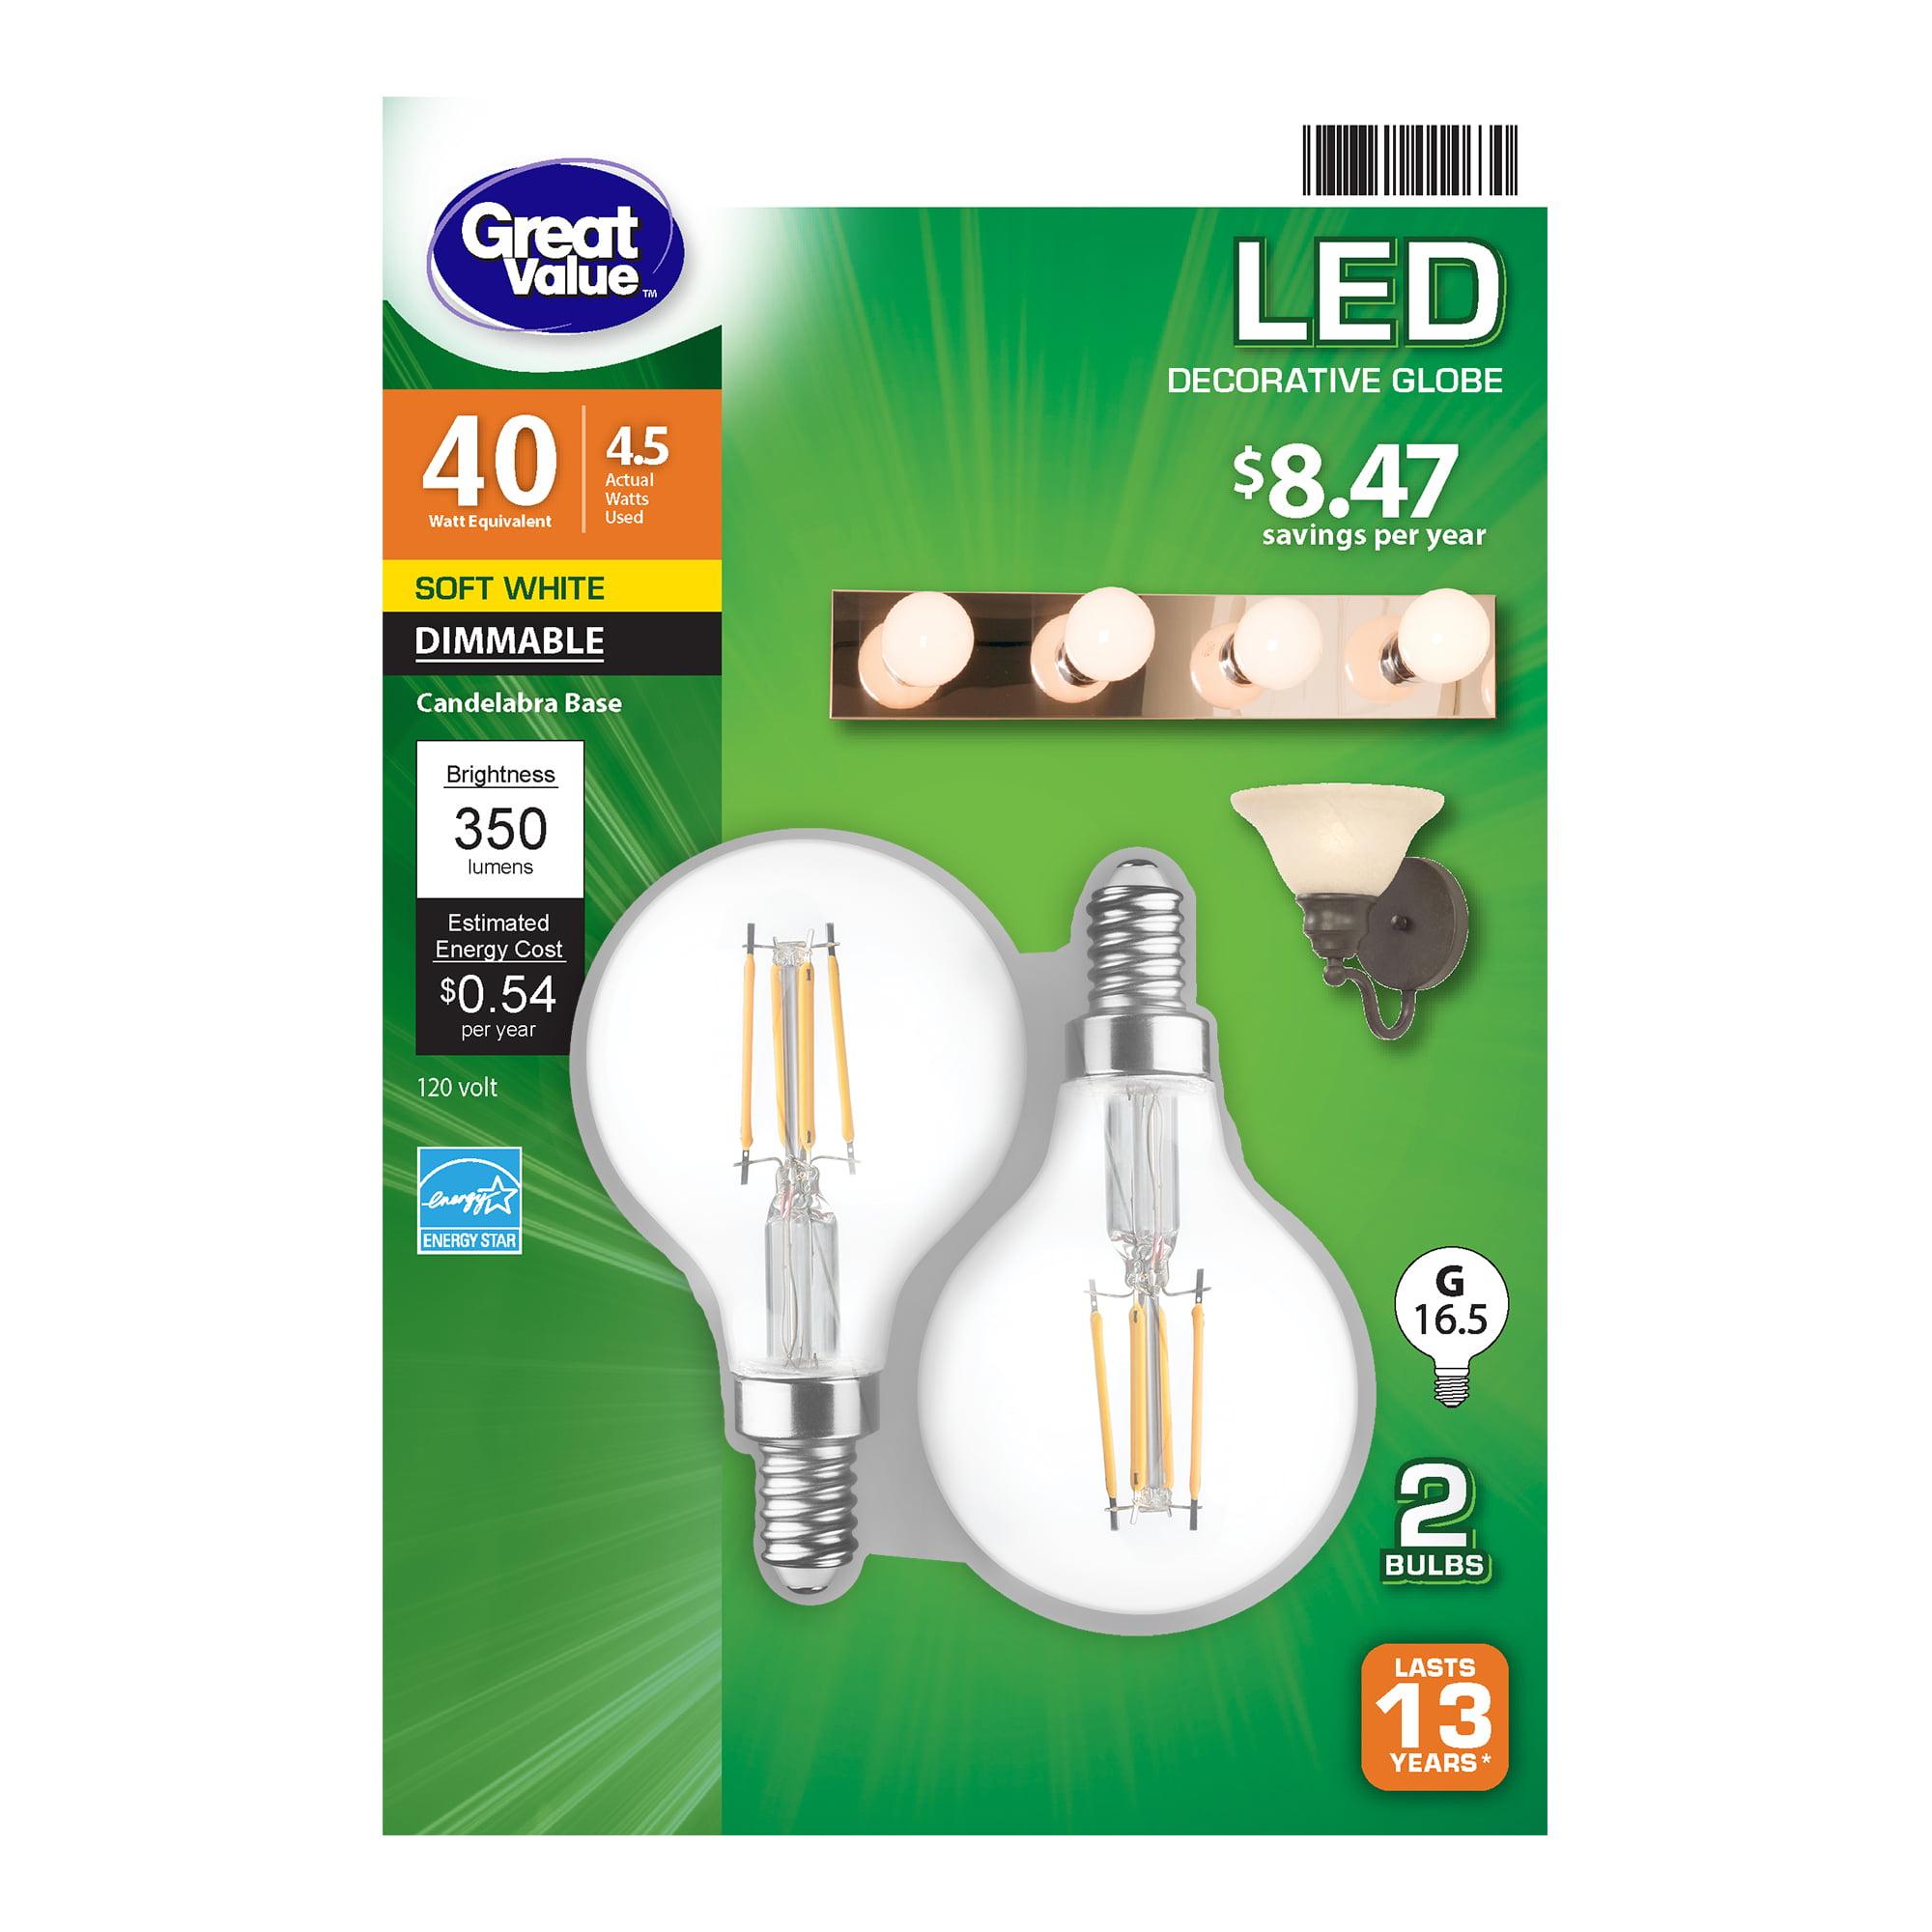 3 Pcs LED Bulb G16 Globe 5W Equivalent 40W E26 Warm White Compatible with Sunlite EOV293 #YY12R